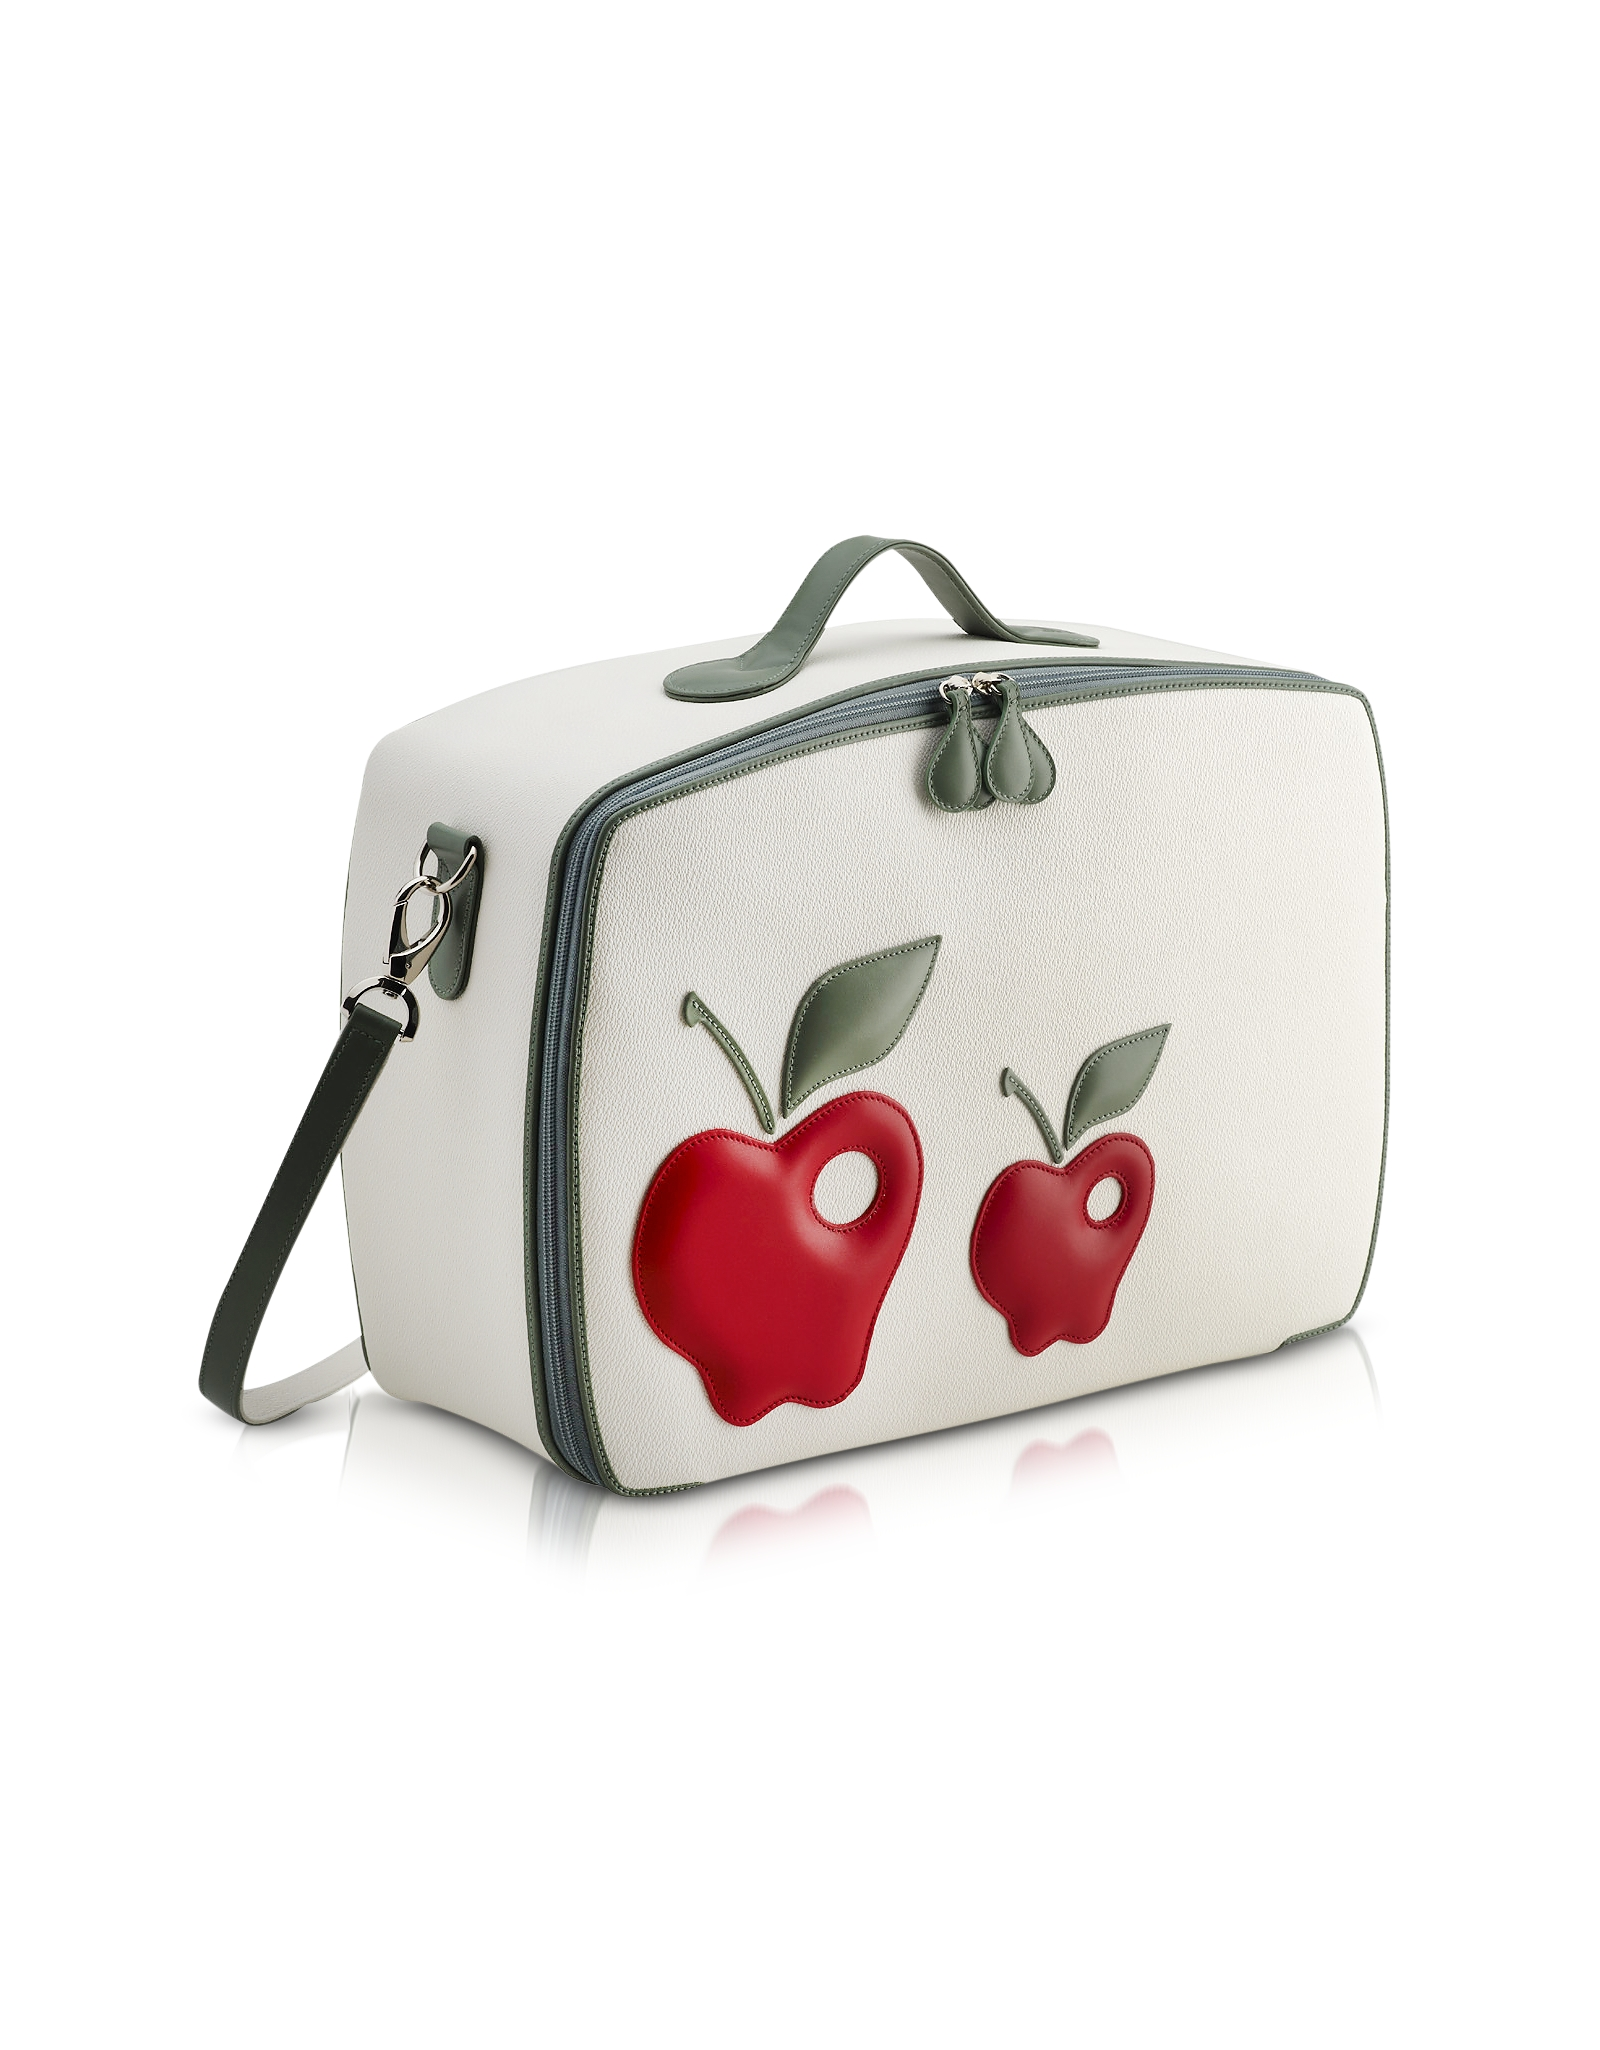 Pineider Red Apple Mini Travel Bag in Red